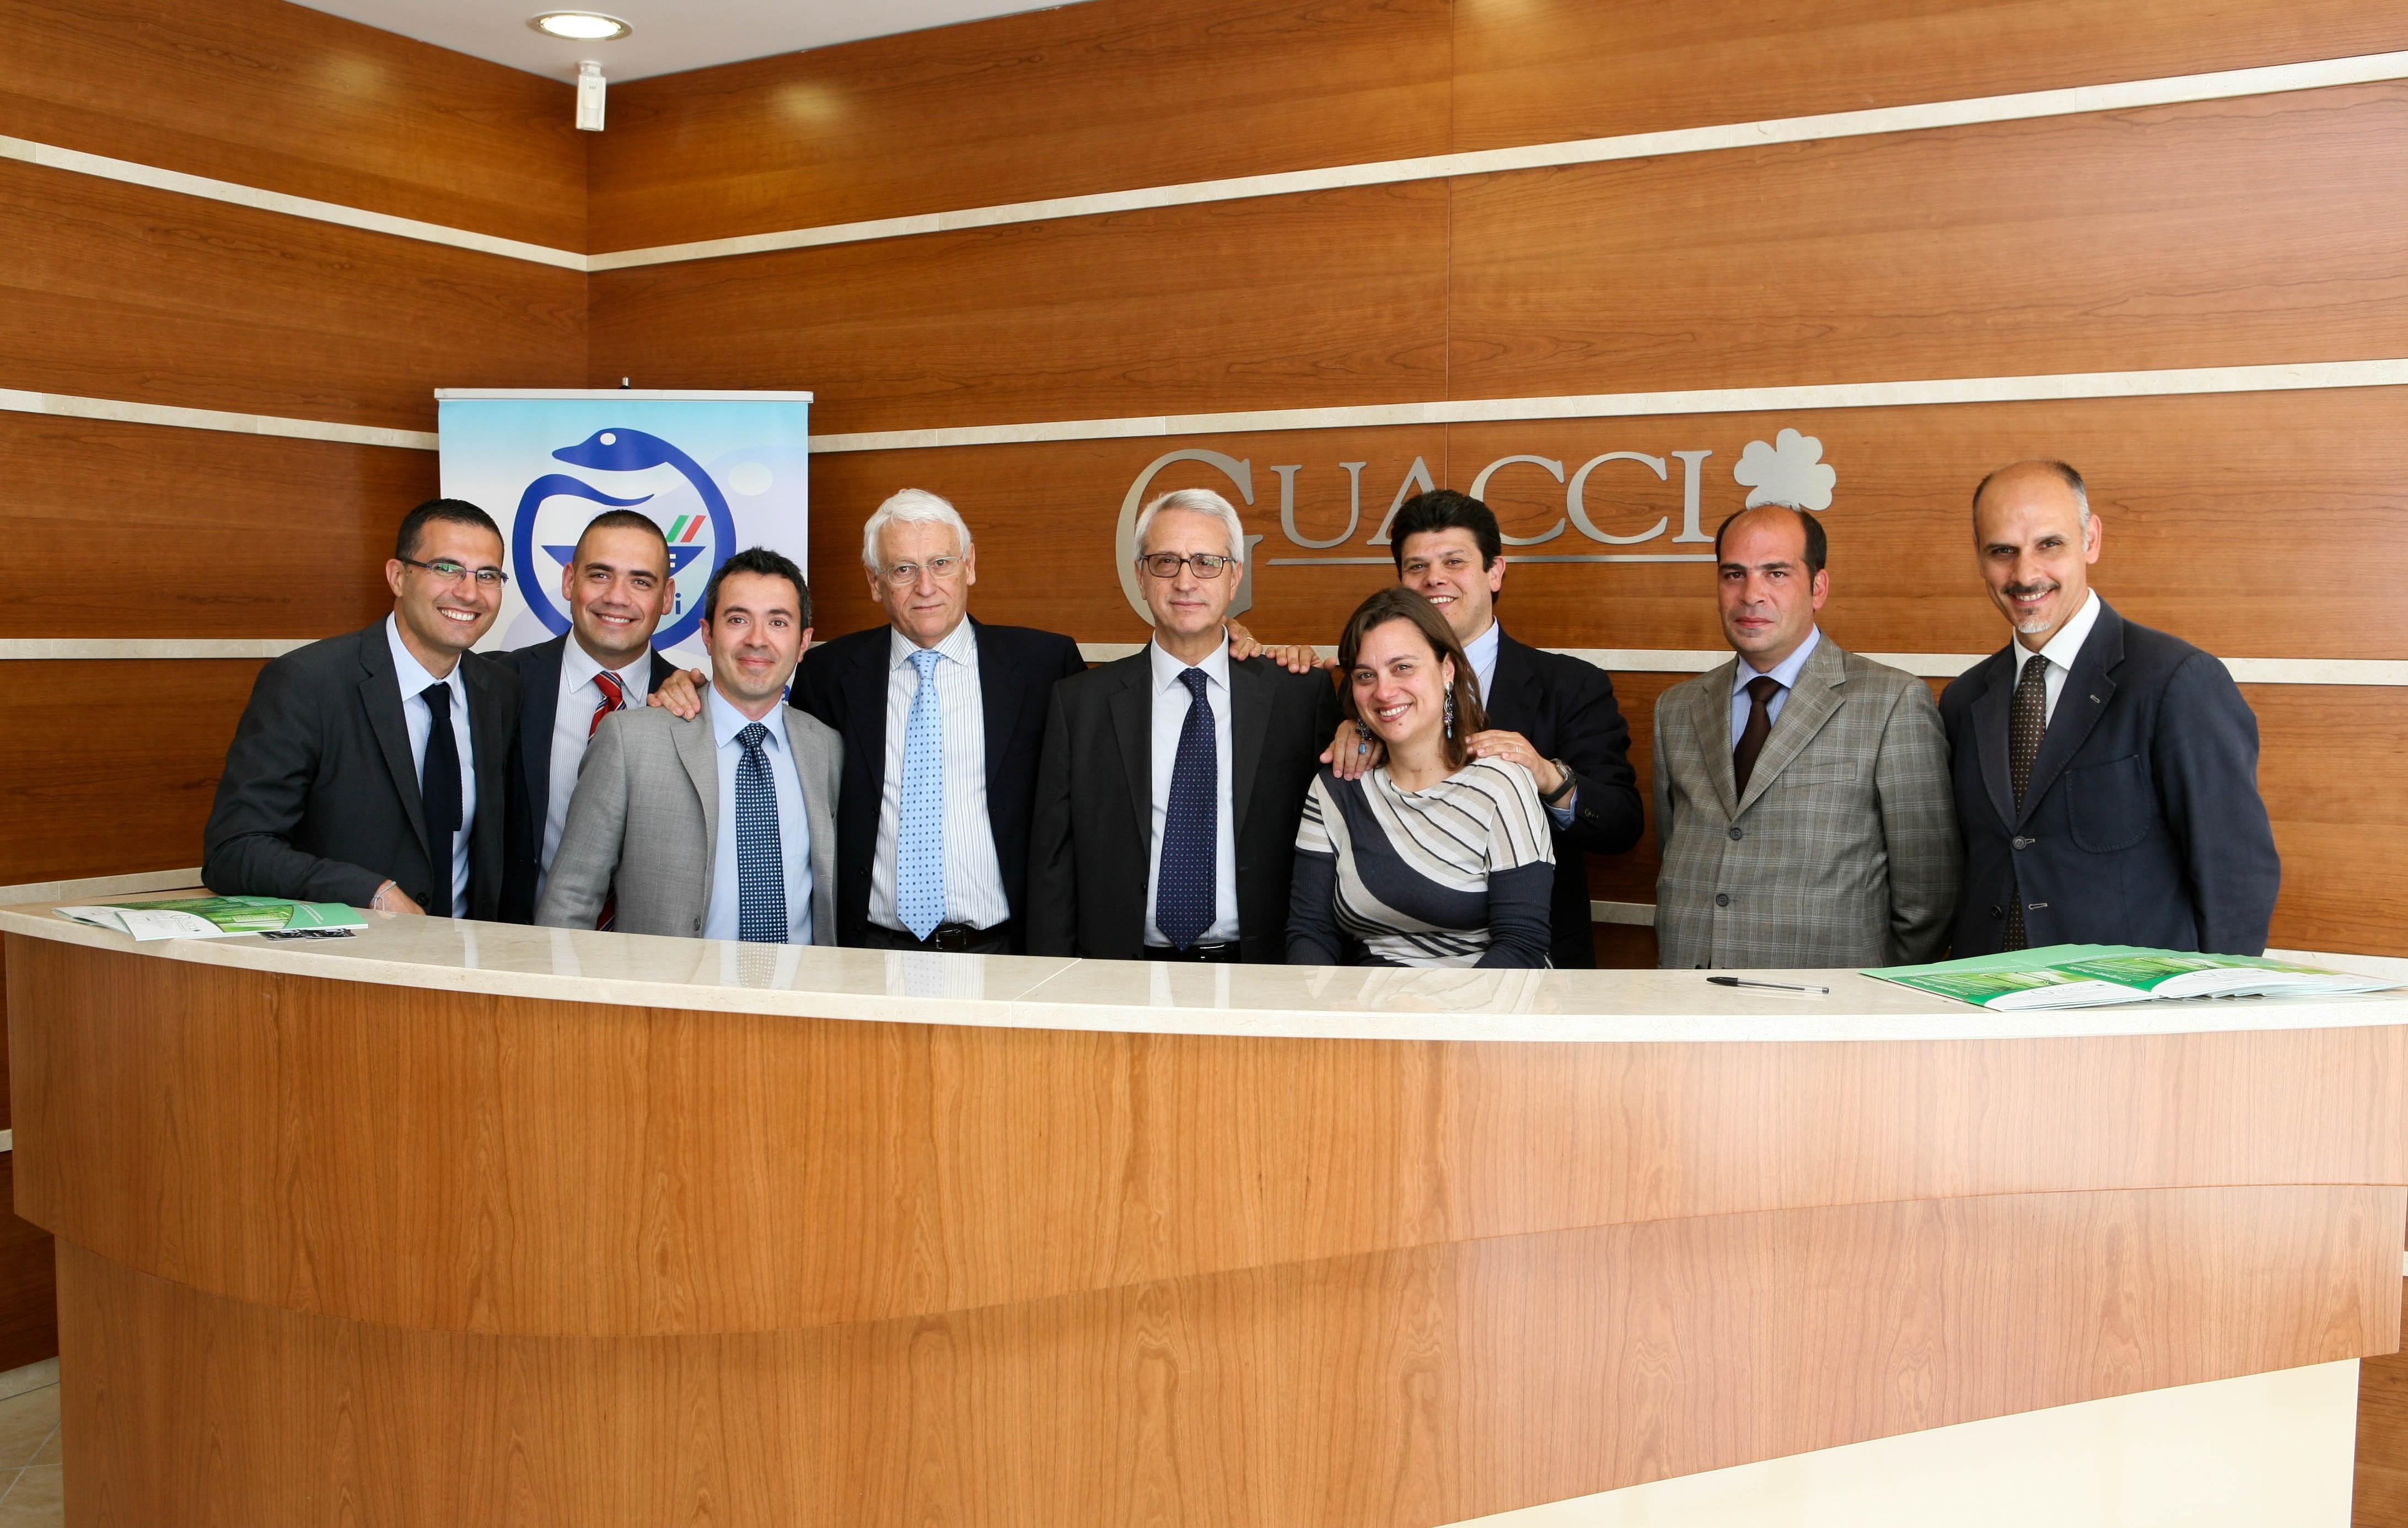 Guacci Day_7